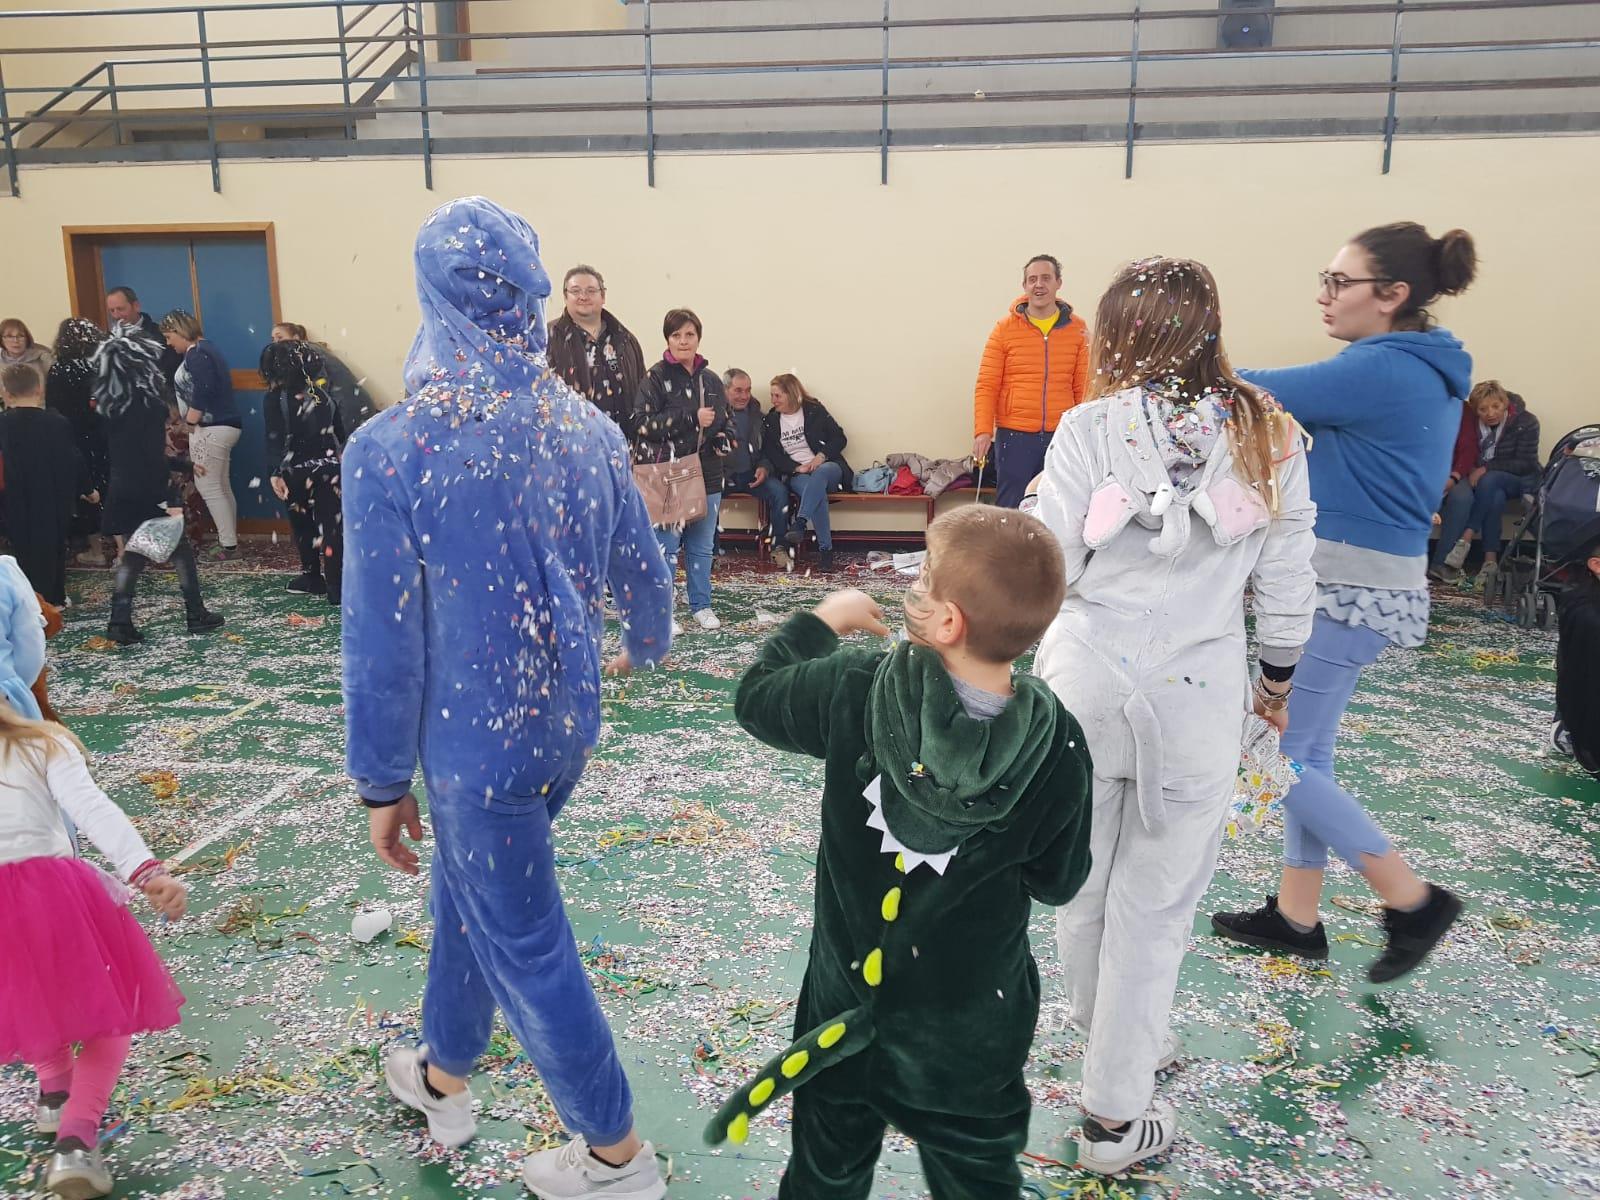 Baraonda Carnevale 2019 (142)